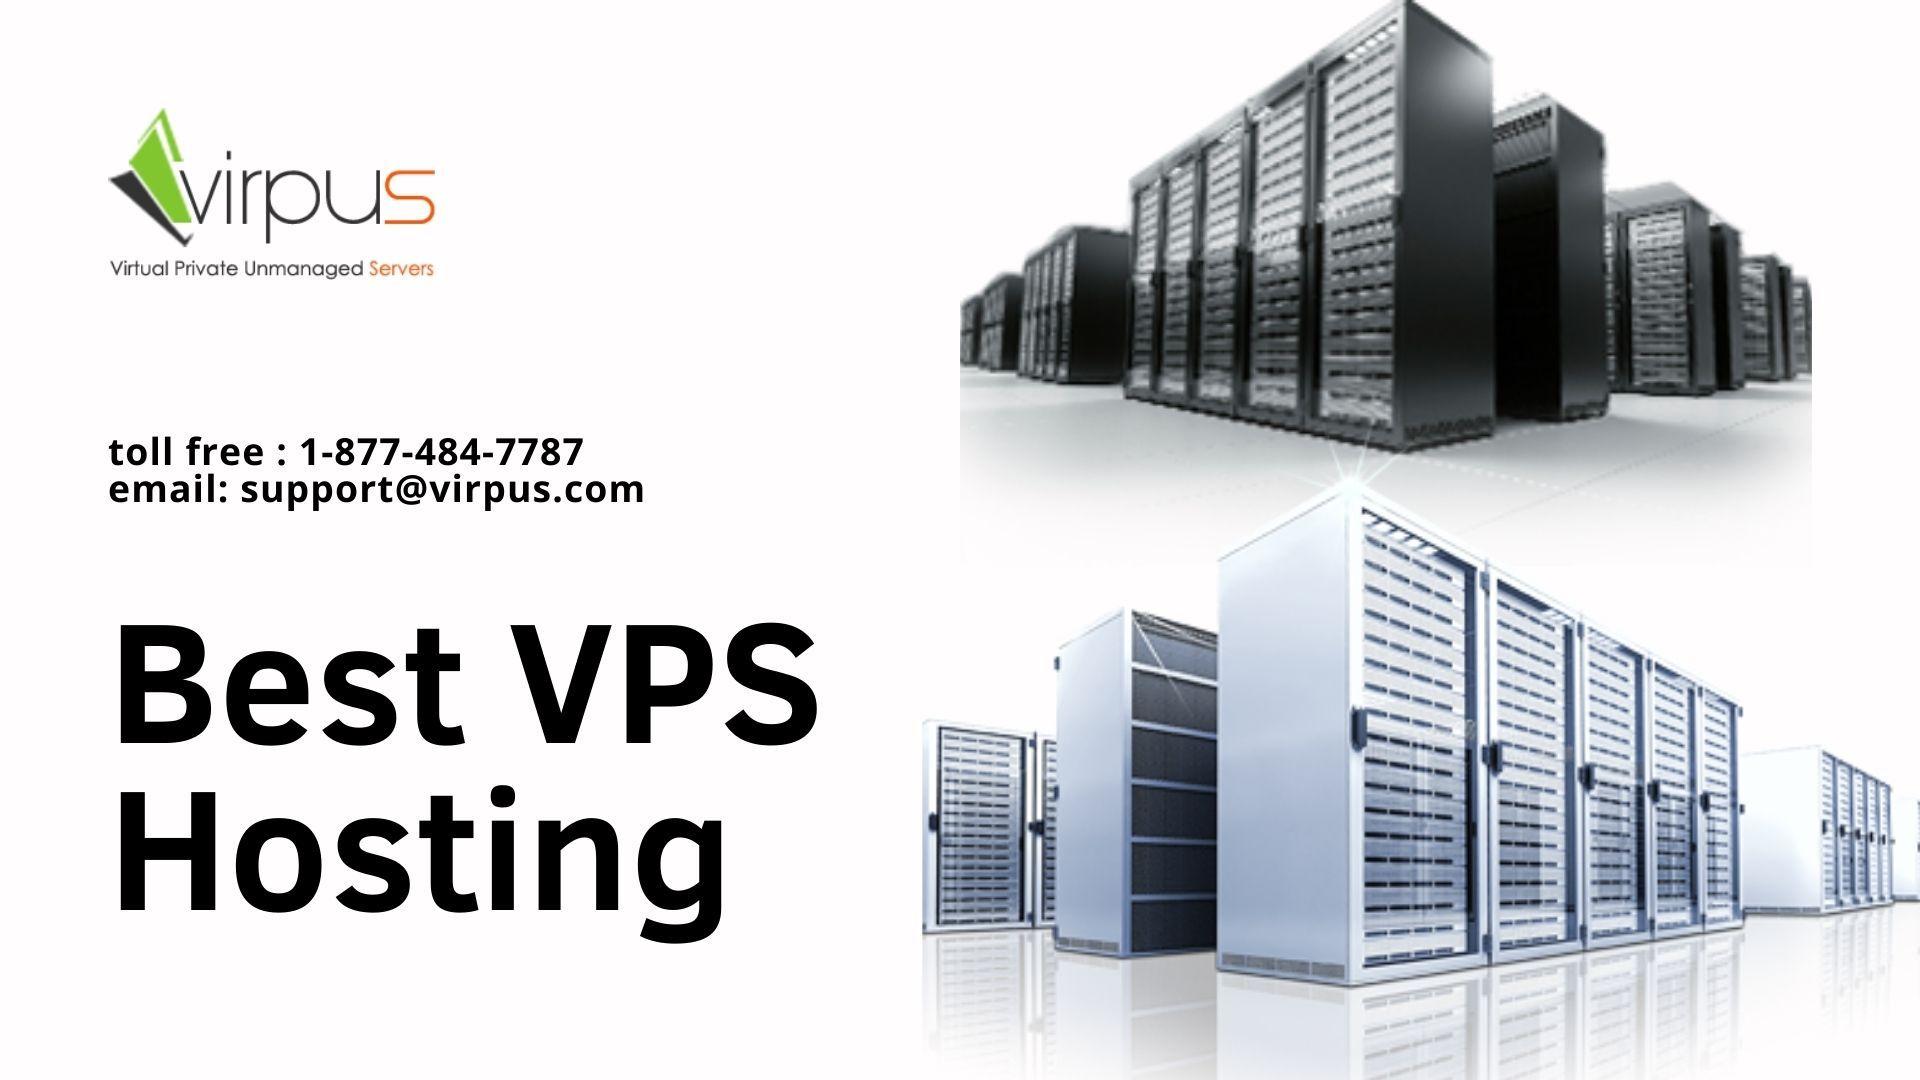 Best VPS Hosting in 20   Hosting, Virtual private server ...